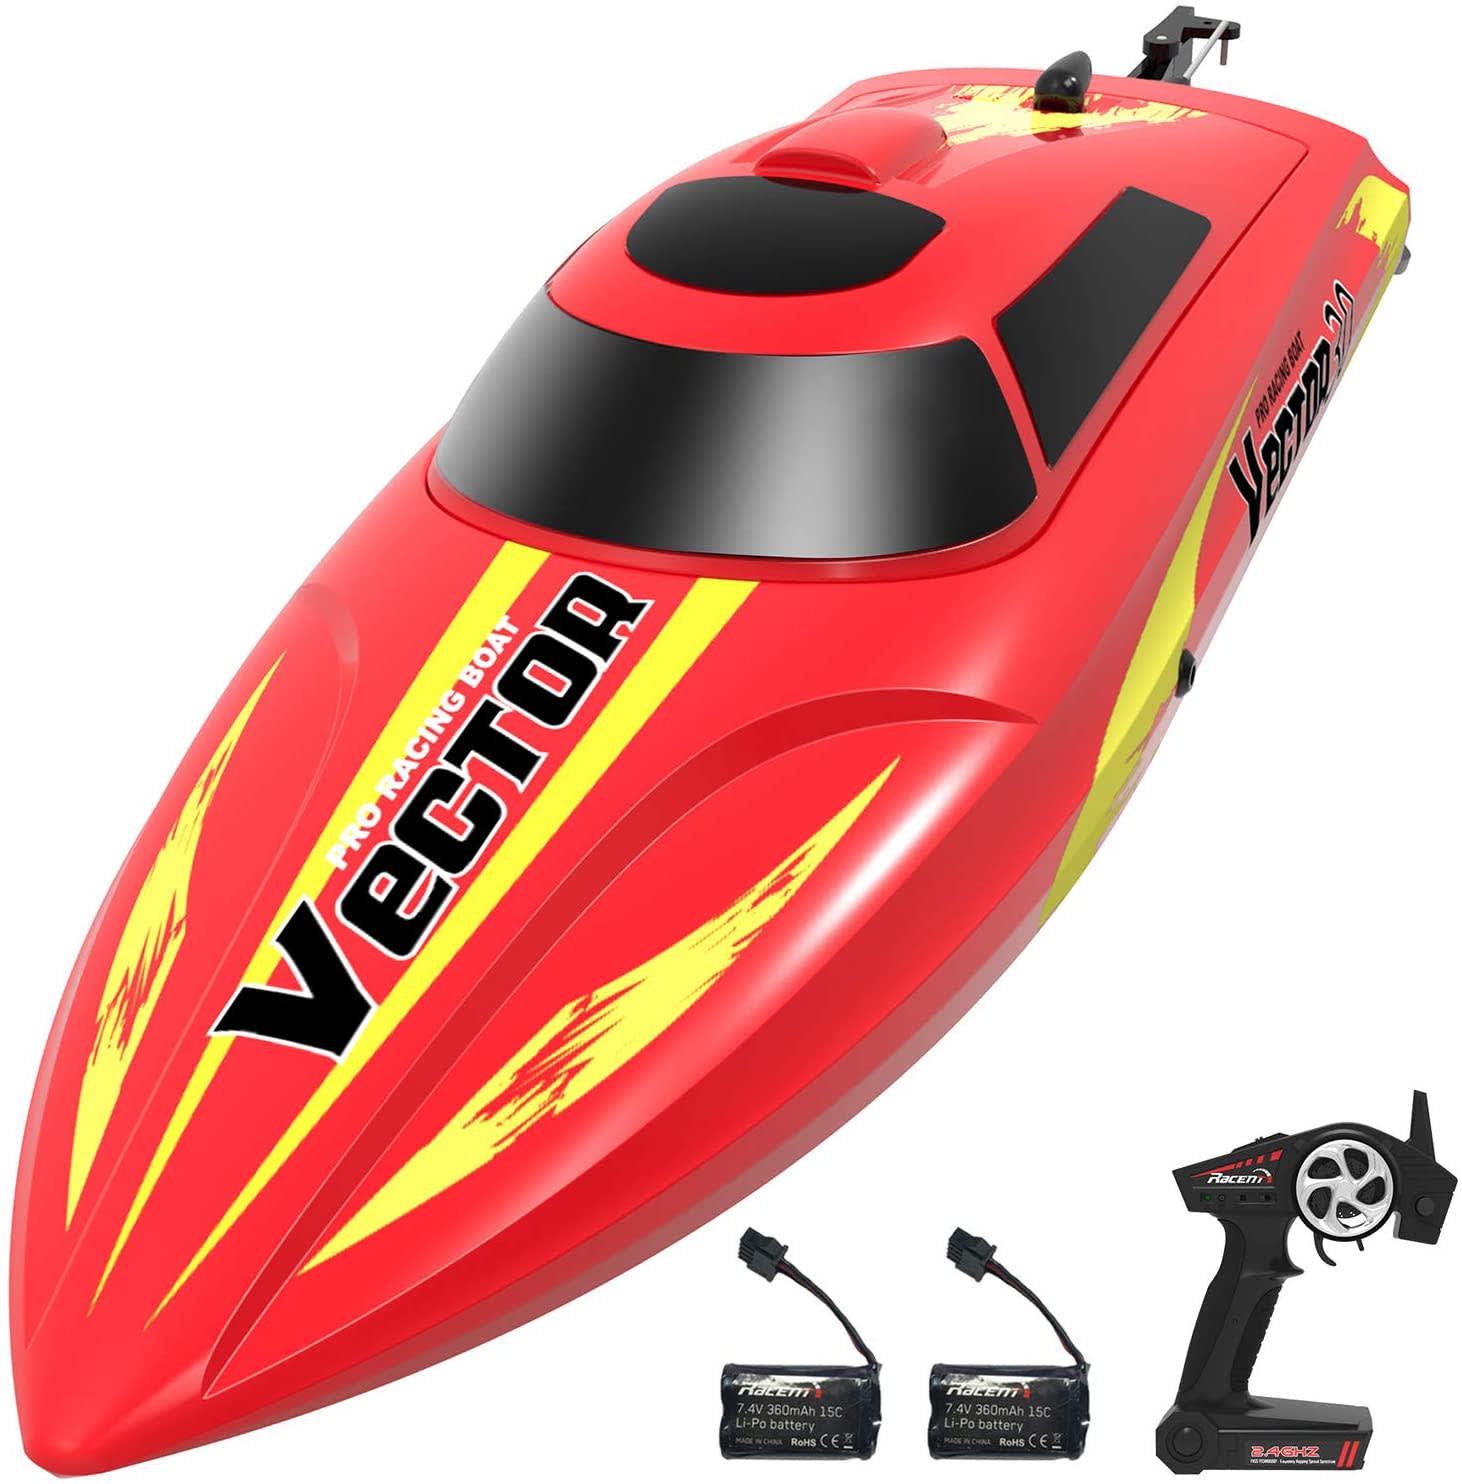 Volantexrc Vector30 RC Boat